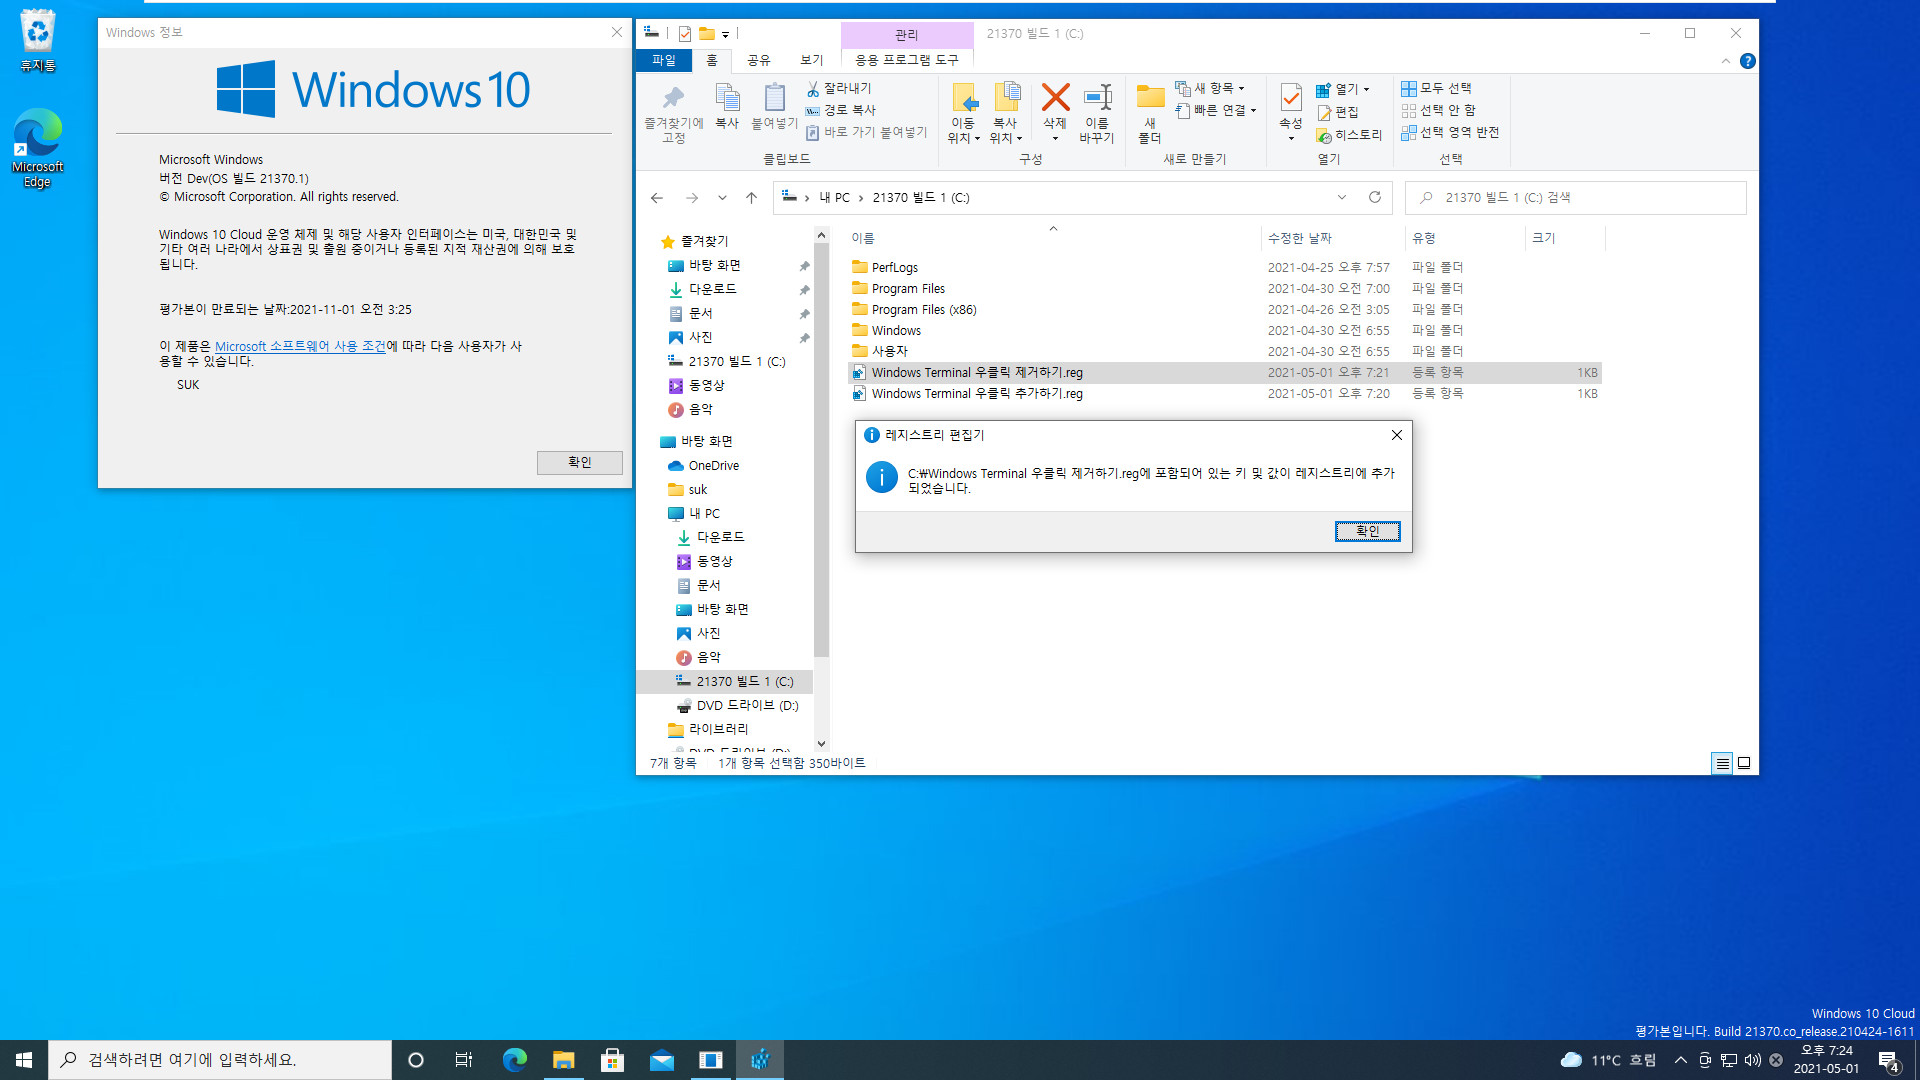 Windows Terminal 우클릭 제거하기.reg와 Windows Terminal 우클릭 추가하기.reg 테스트 2021-05-01_192411.jpg